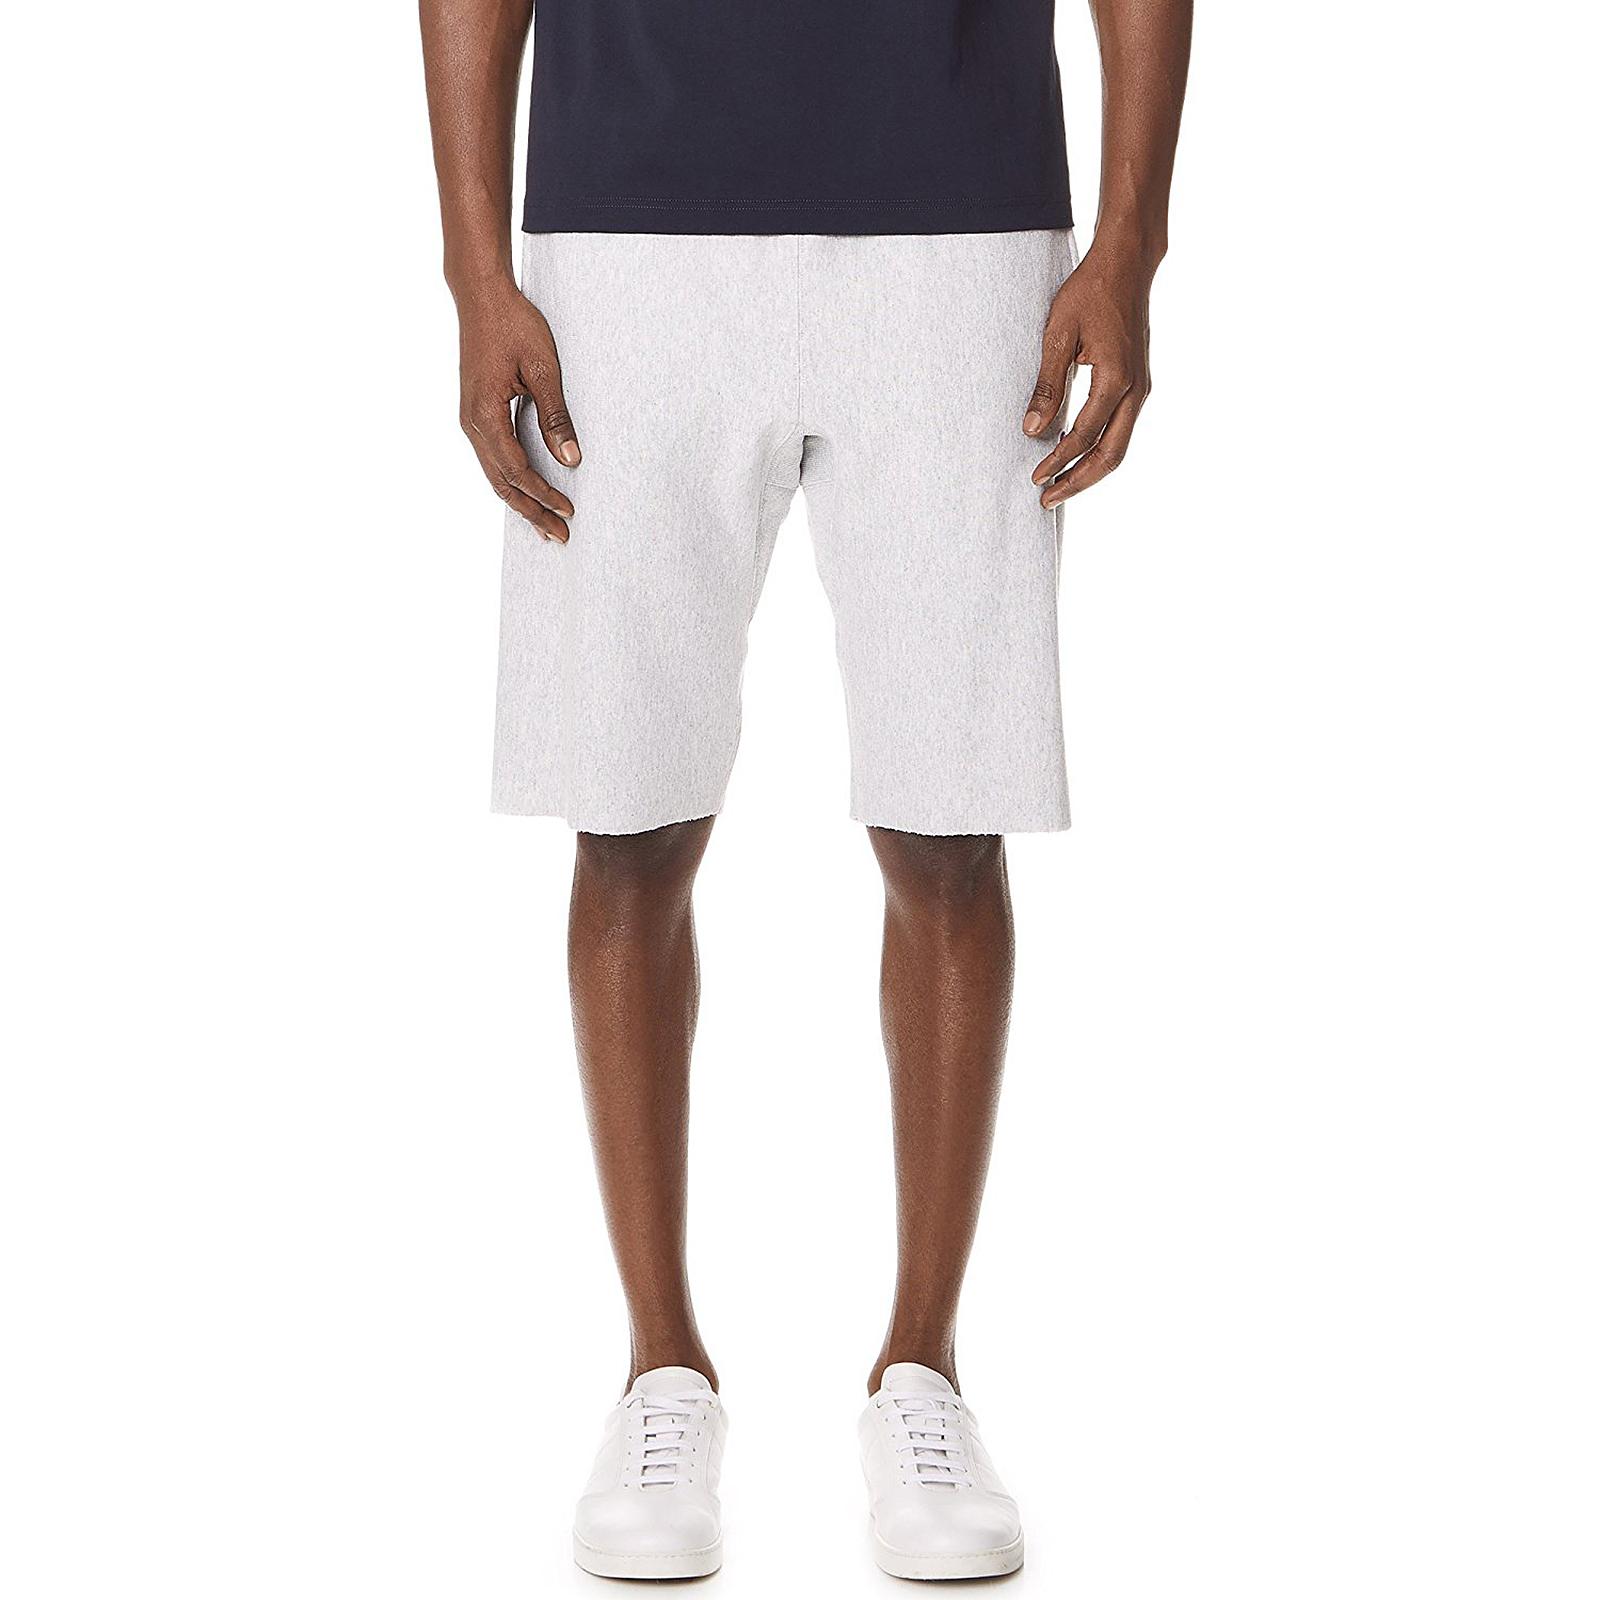 Champion Shorts Bermuda Sweatshirt Loxgm White